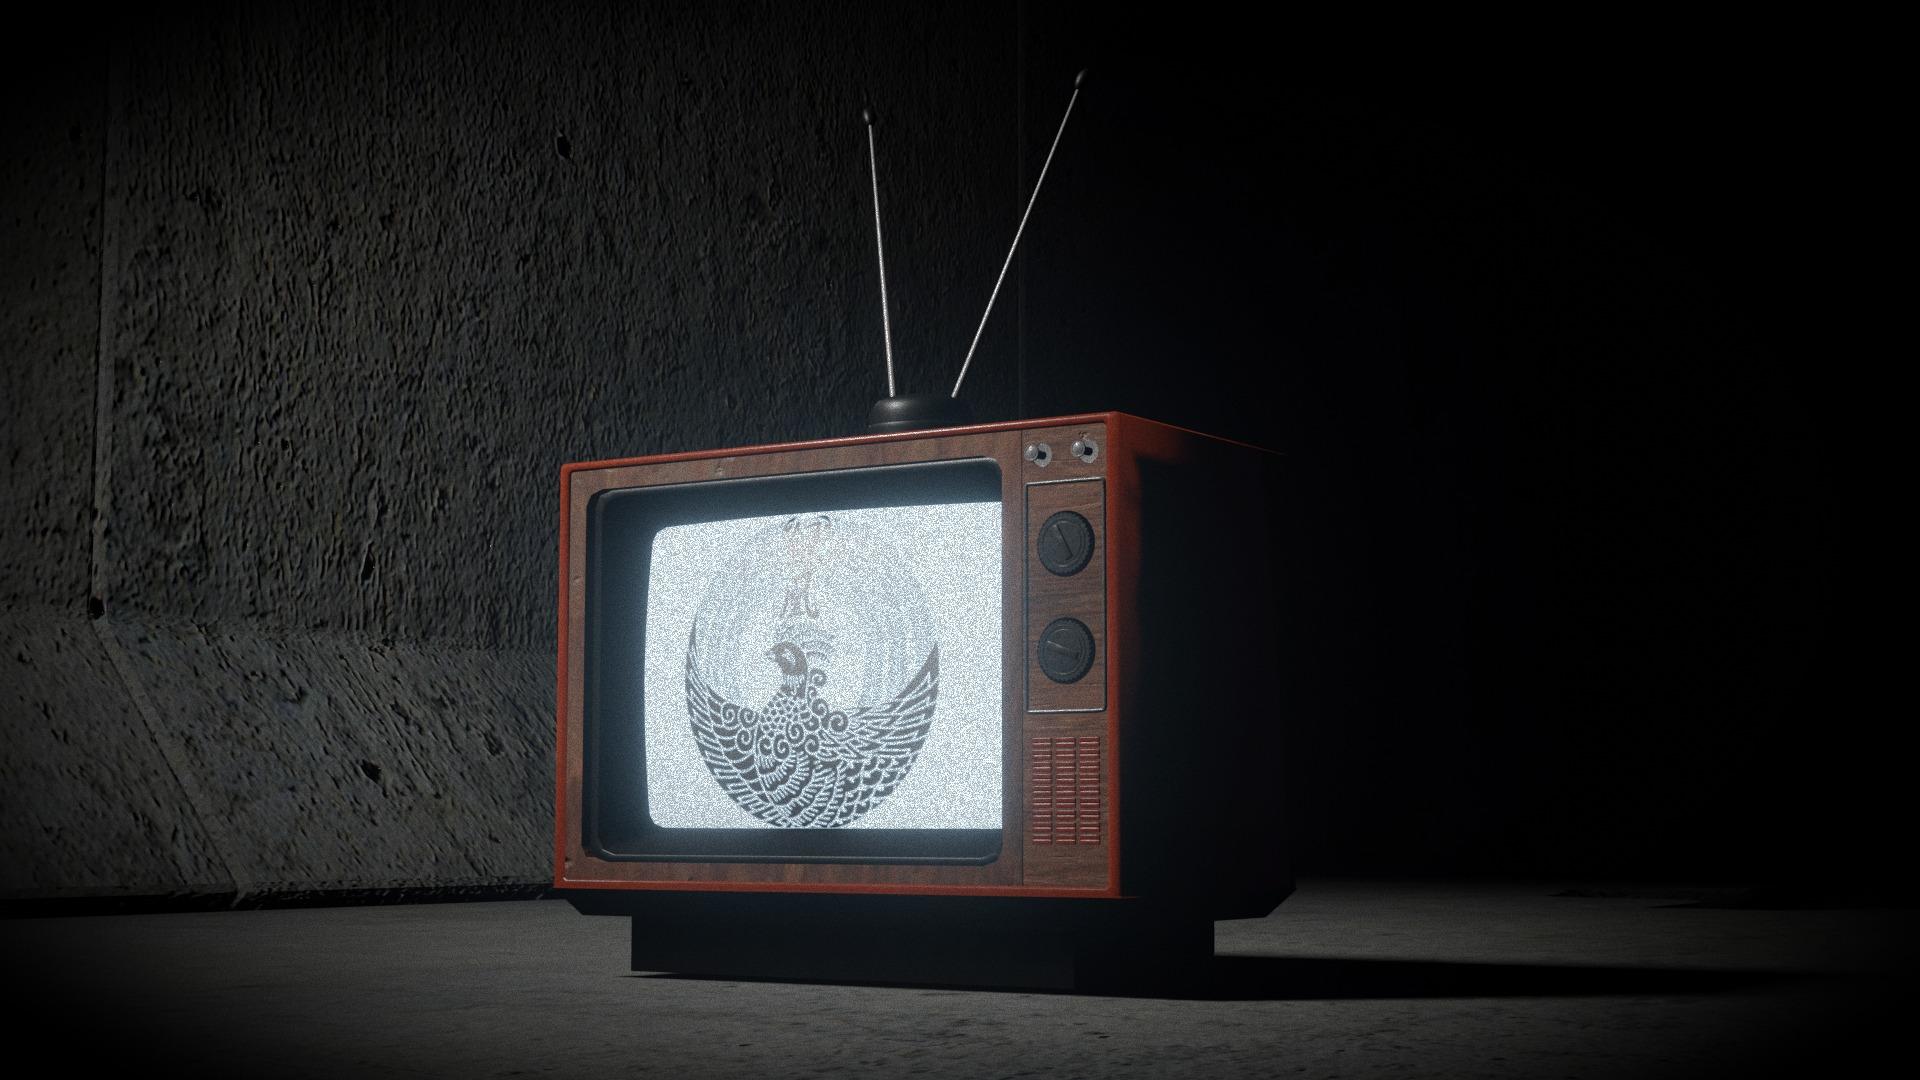 tv_edited